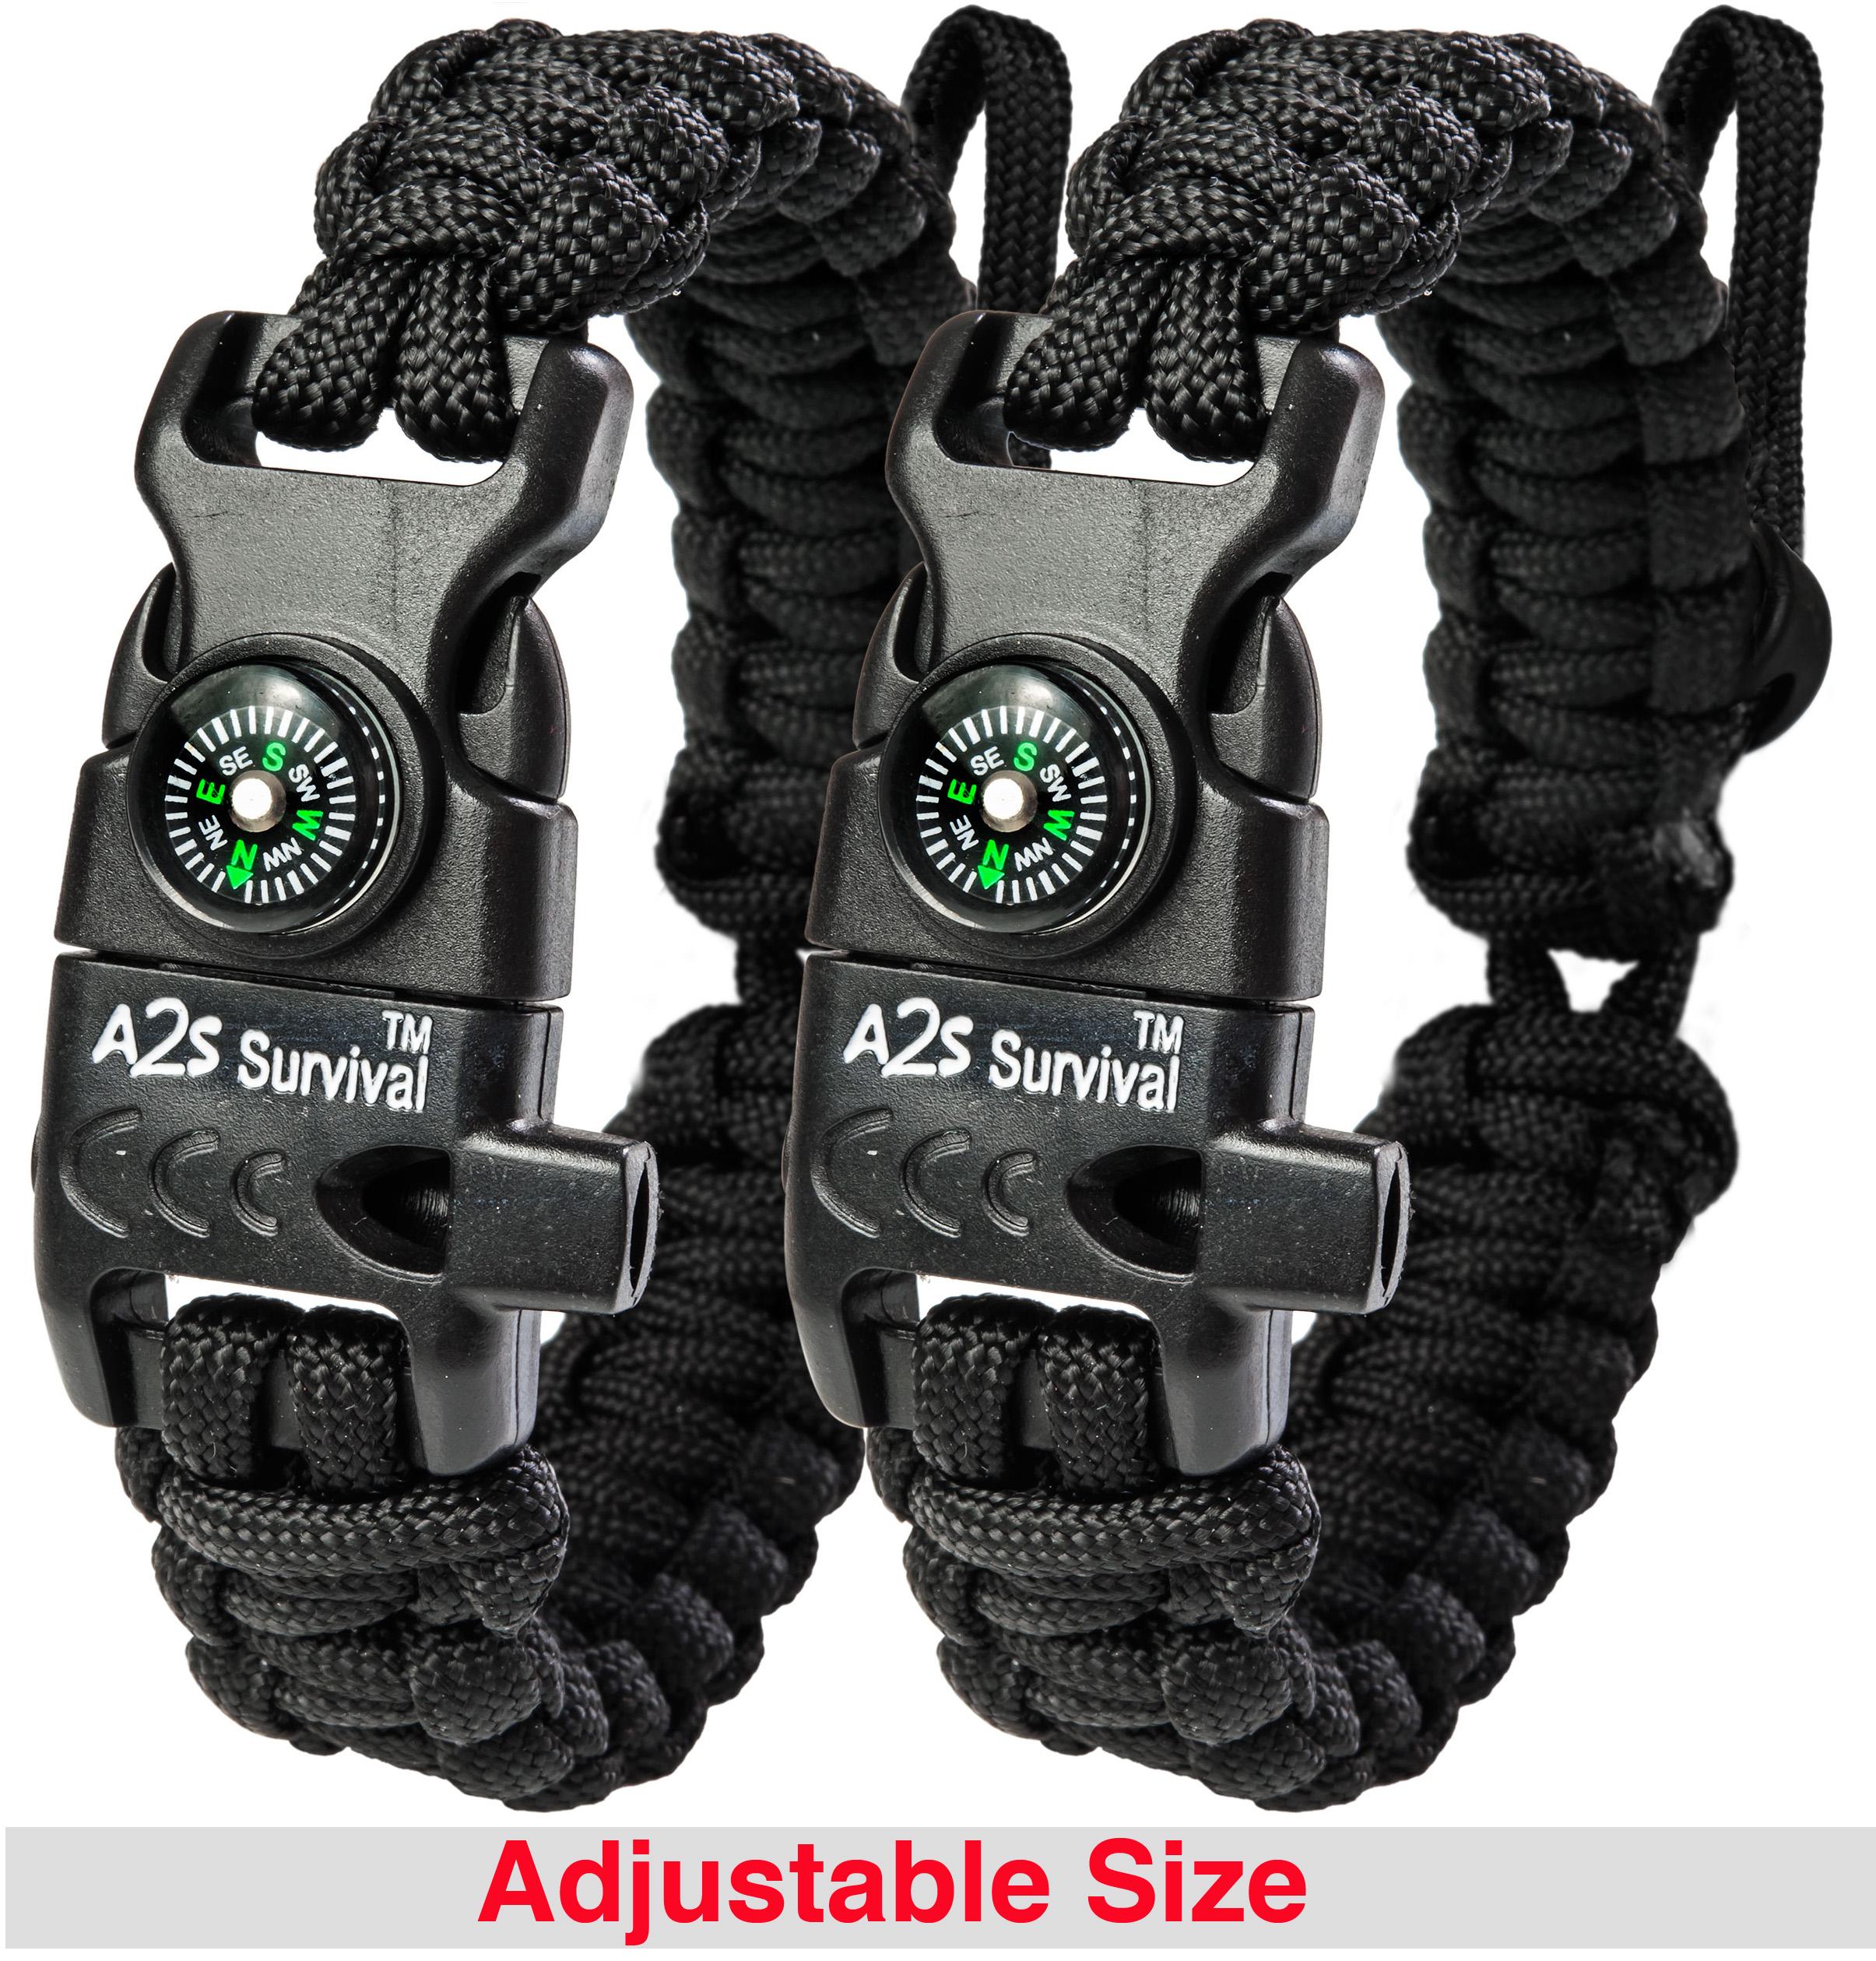 A2S Protection Paracord Bracelet K2-Peak - Survival Gear Kit with Embedded Compass, Fire Starter, Emergency Knife & Whistle Black / Black Adjustable size